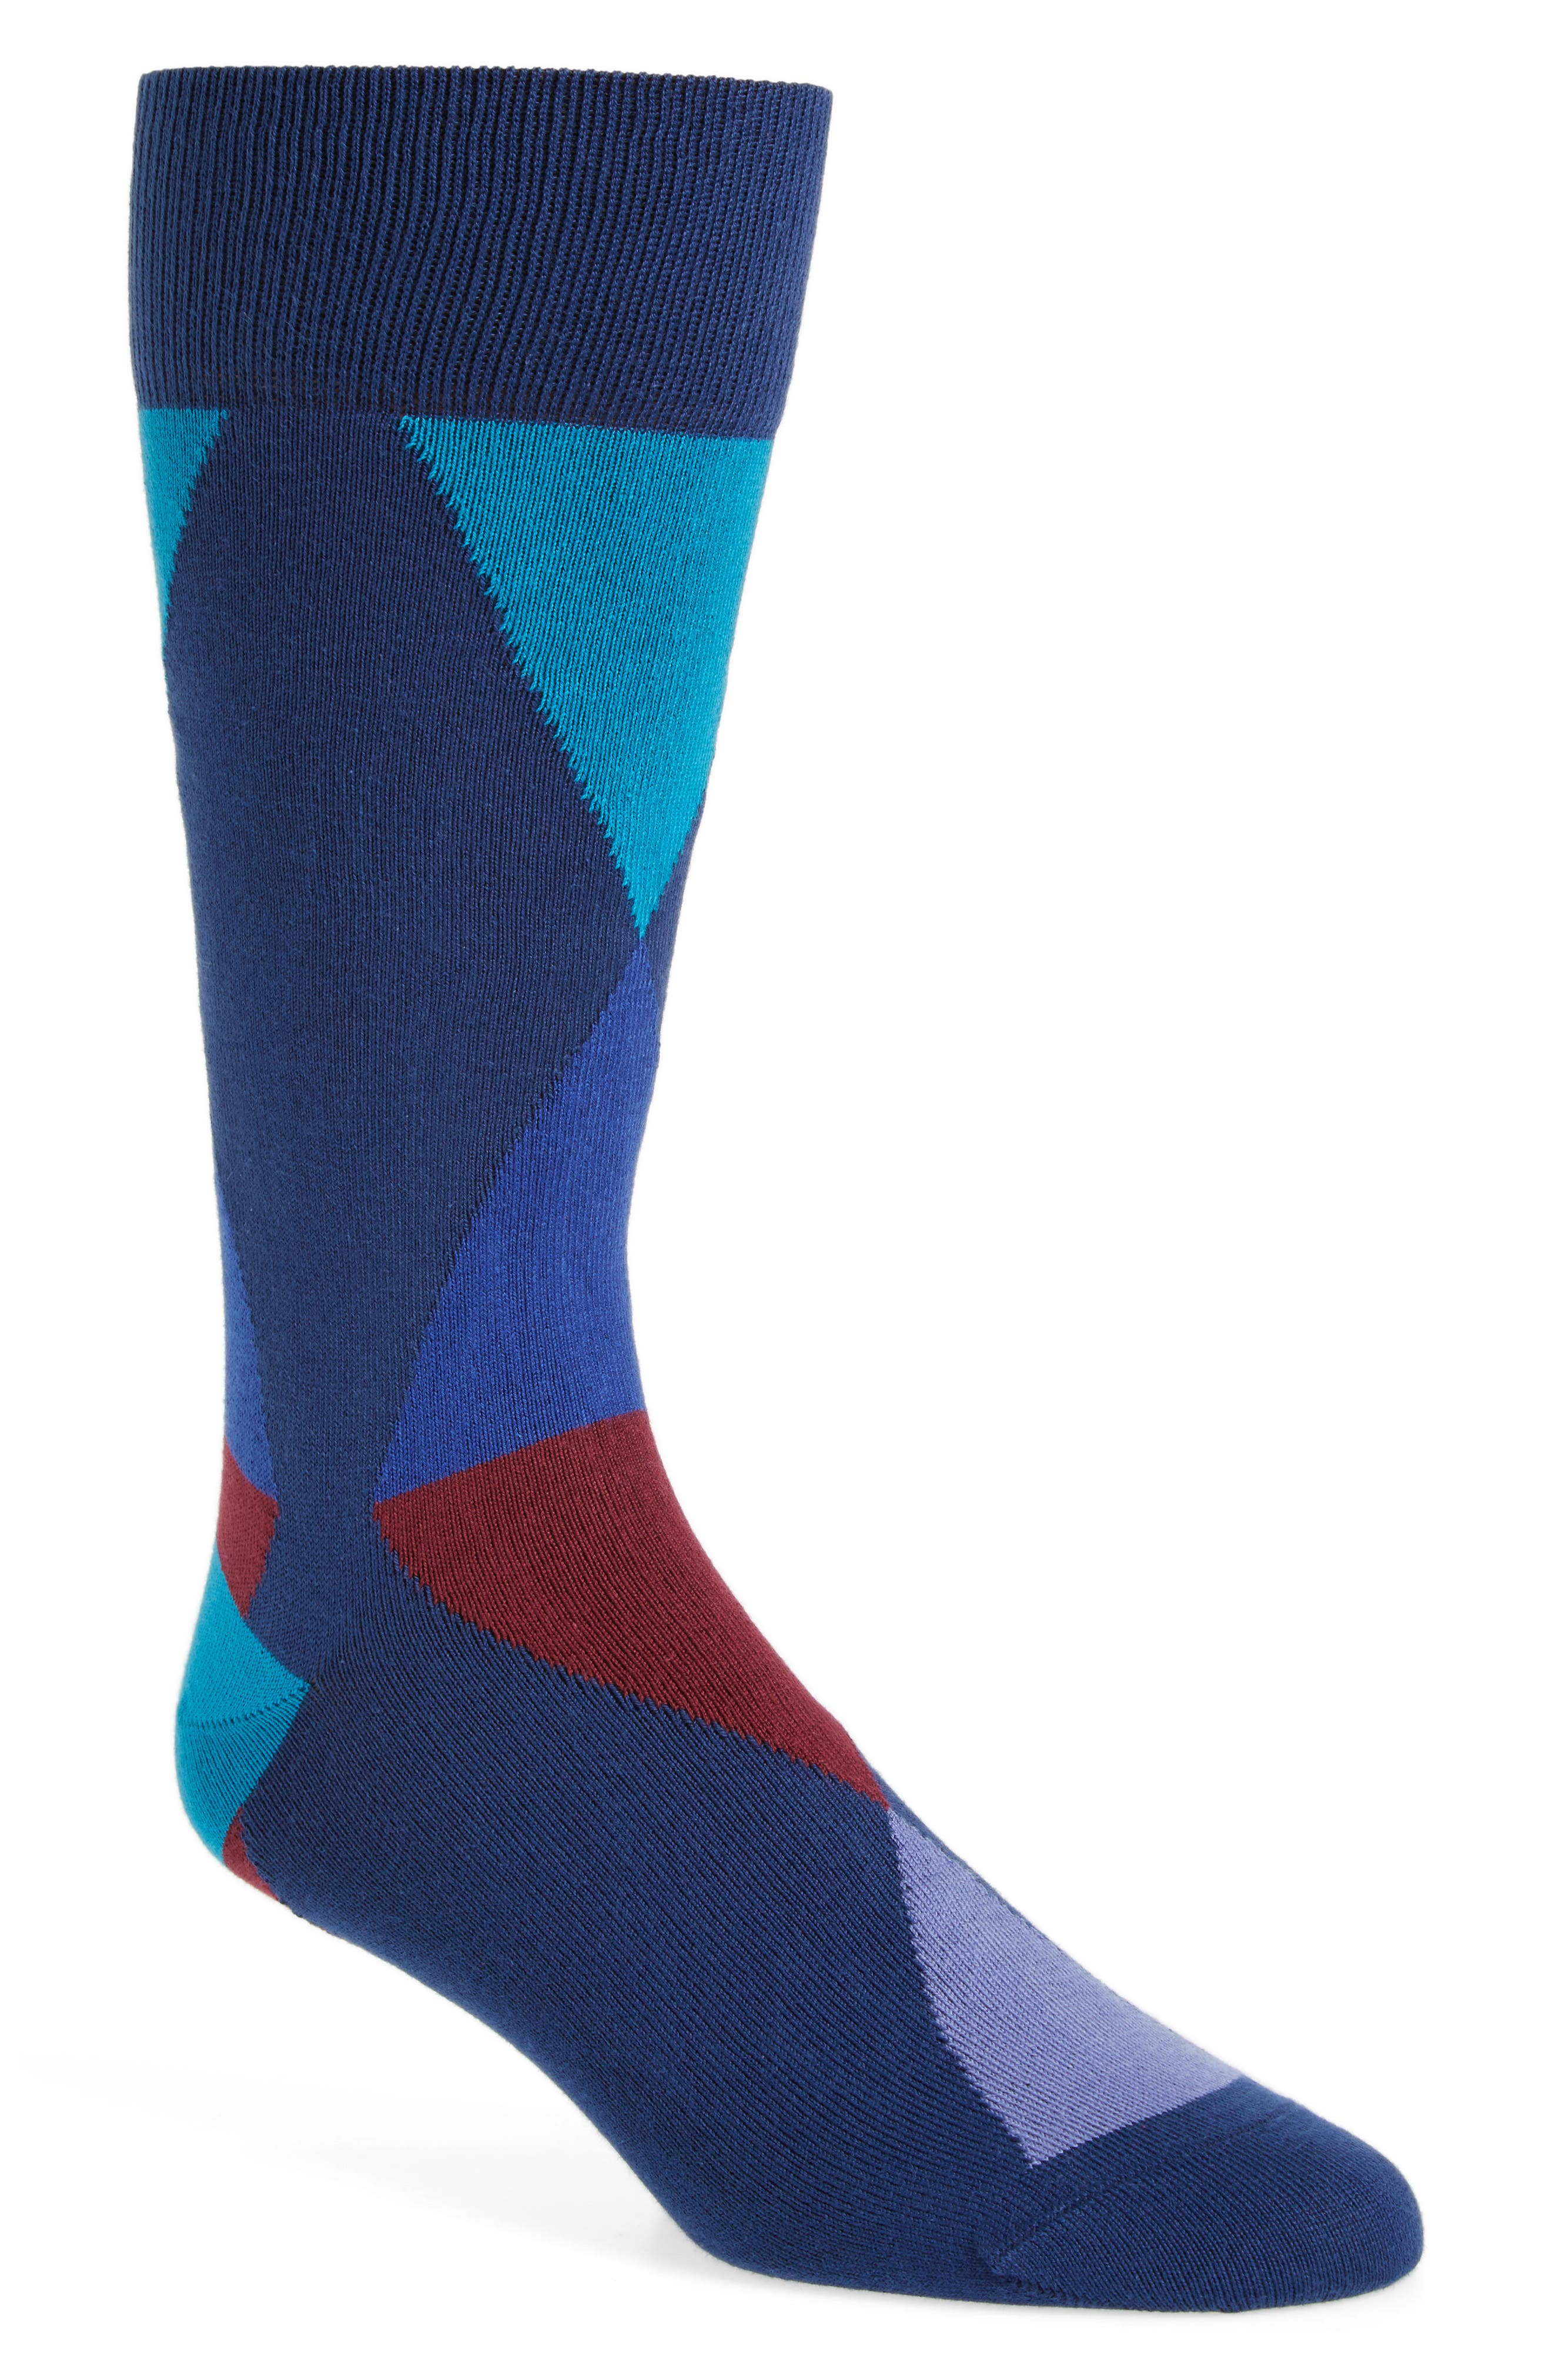 Geo Geometric Socks,                             Main thumbnail 1, color,                             400